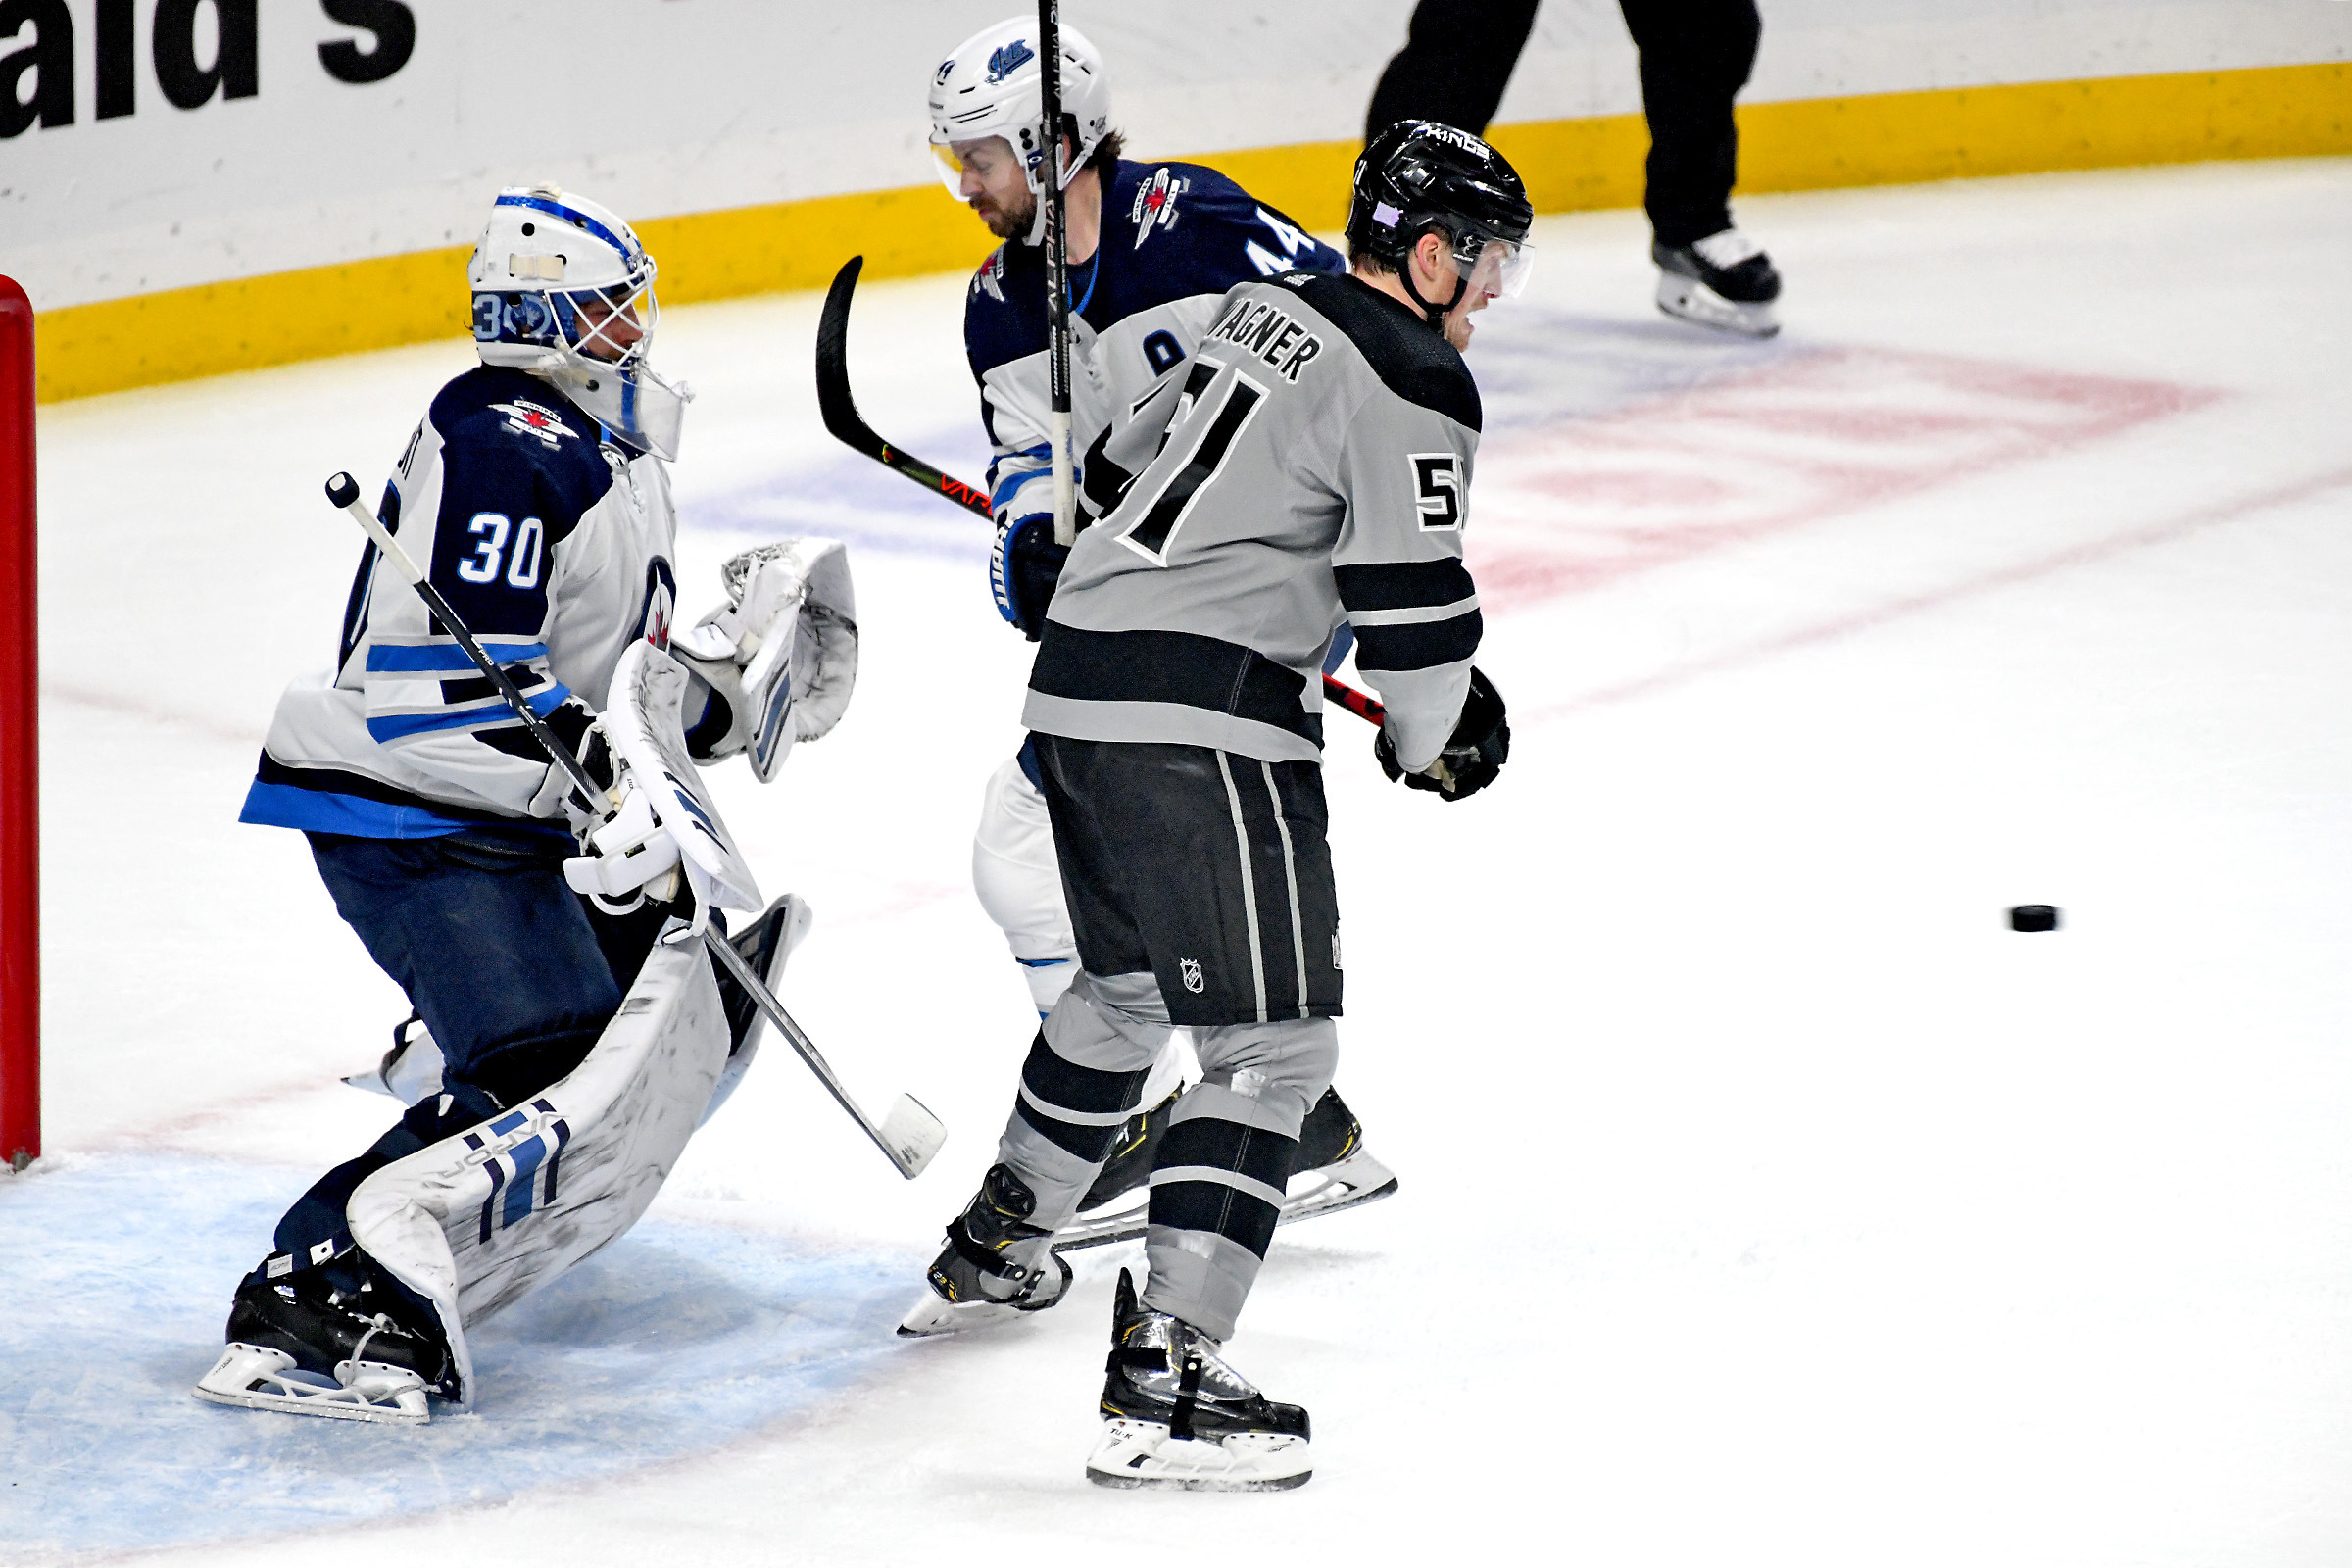 NHL: NOV 30 Jets at Kings